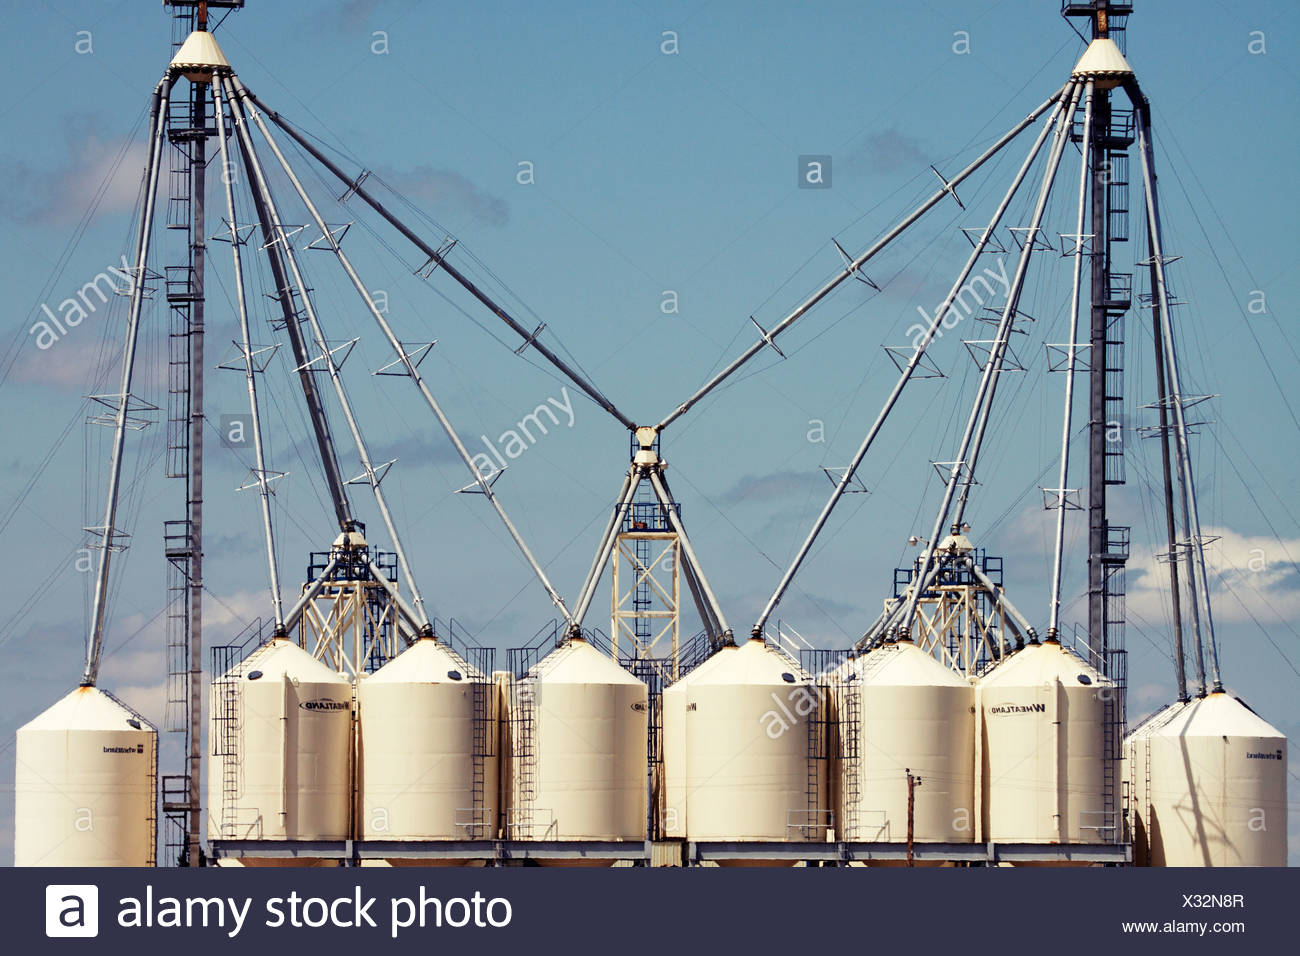 Grain elevators near Hussar, Alberta on the Canadian prairie. - Stock Image